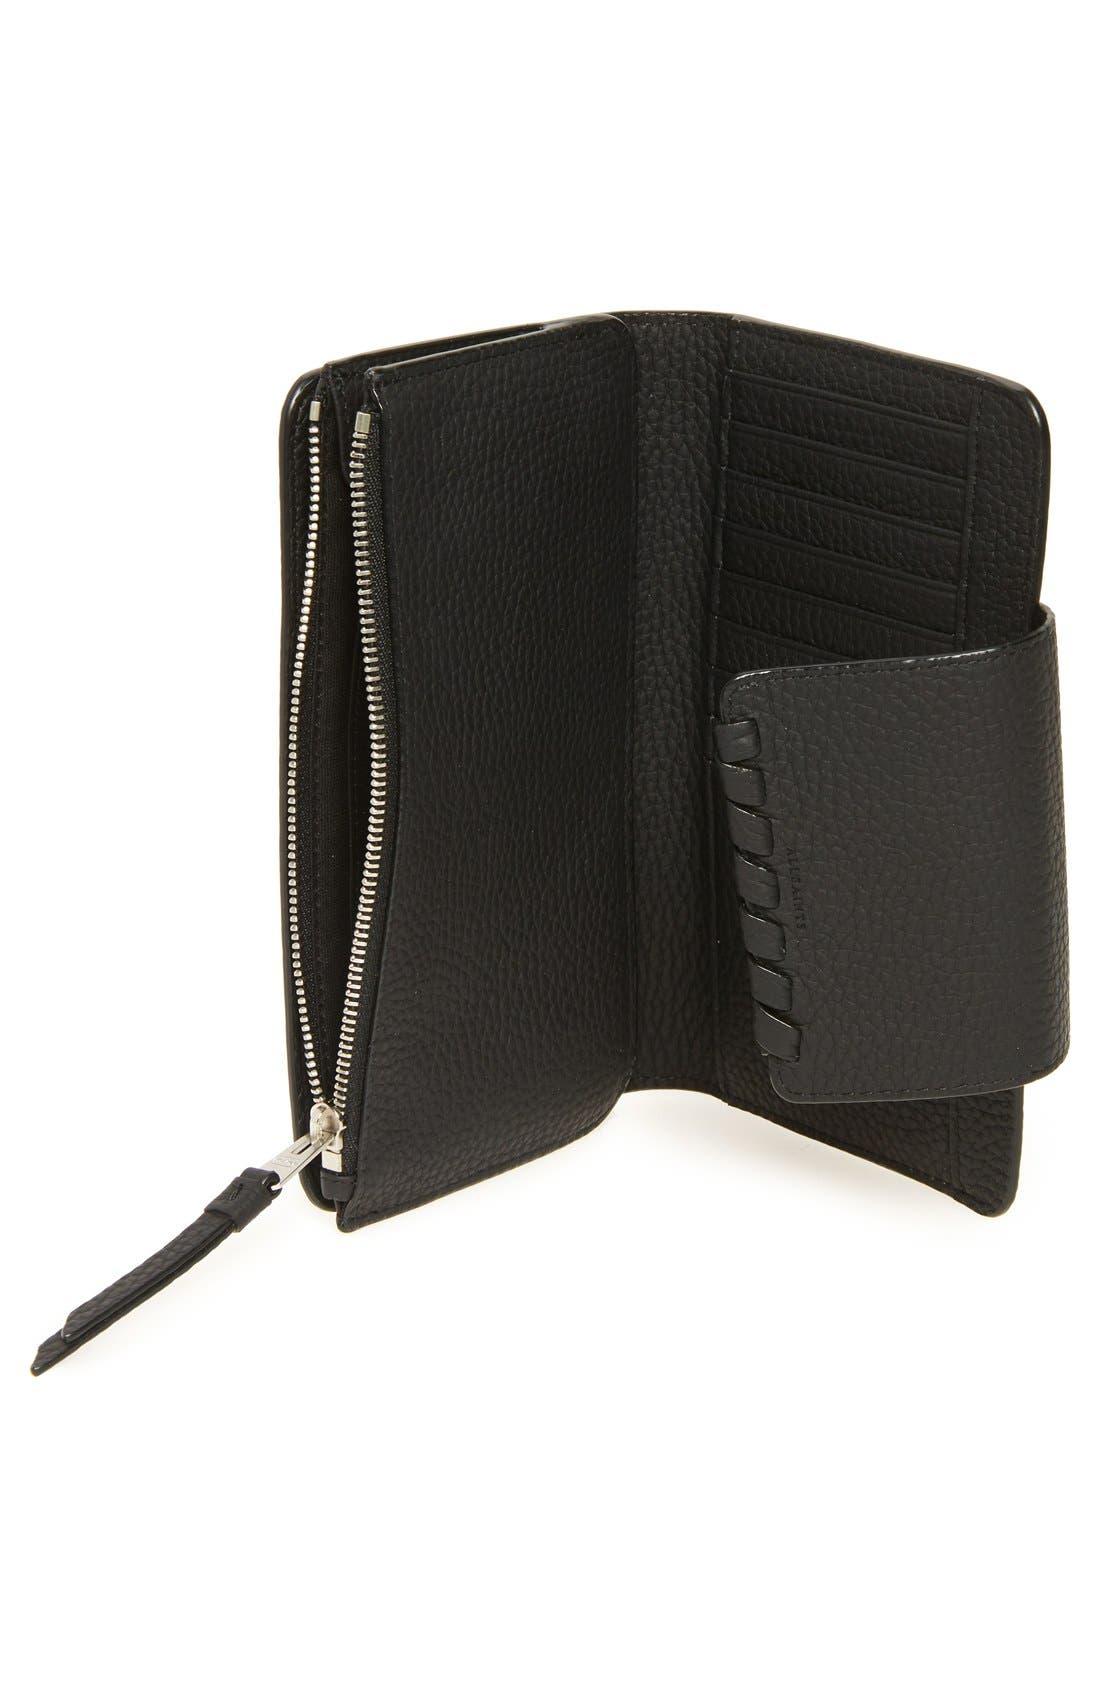 Kita Japanese Leather Wallet,                             Alternate thumbnail 3, color,                             001